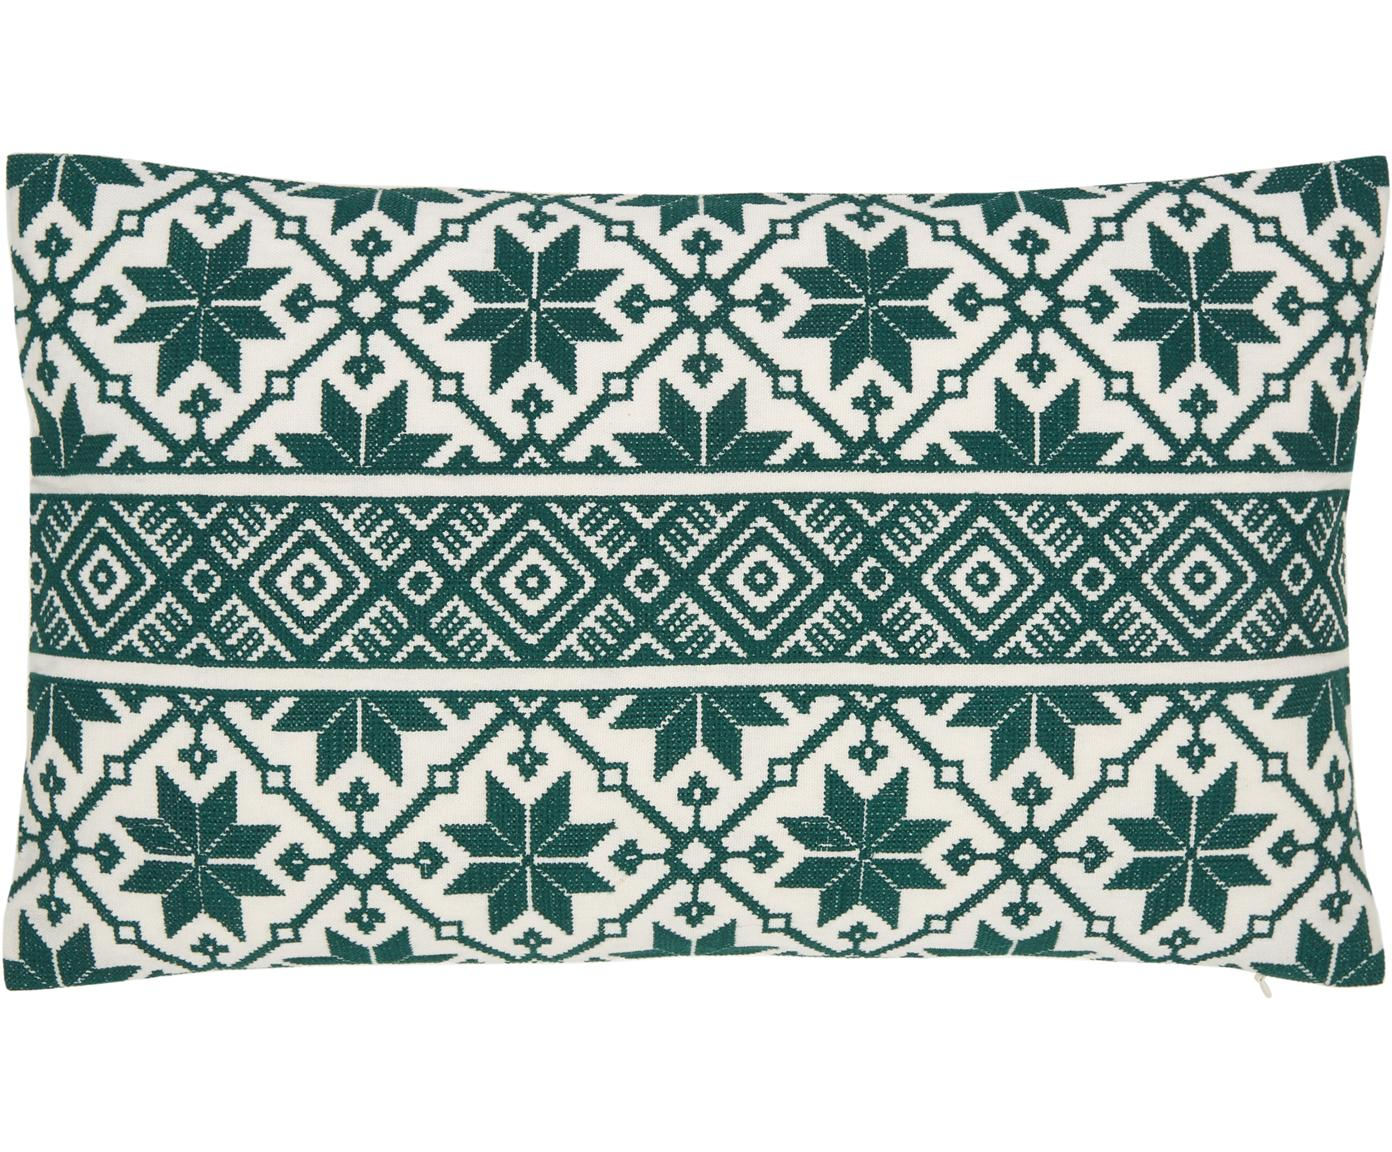 Funda de cojín Shetland, 100%algodón, Verde, blanco crema, Cama 180/200 cm (260 x 220 cm)